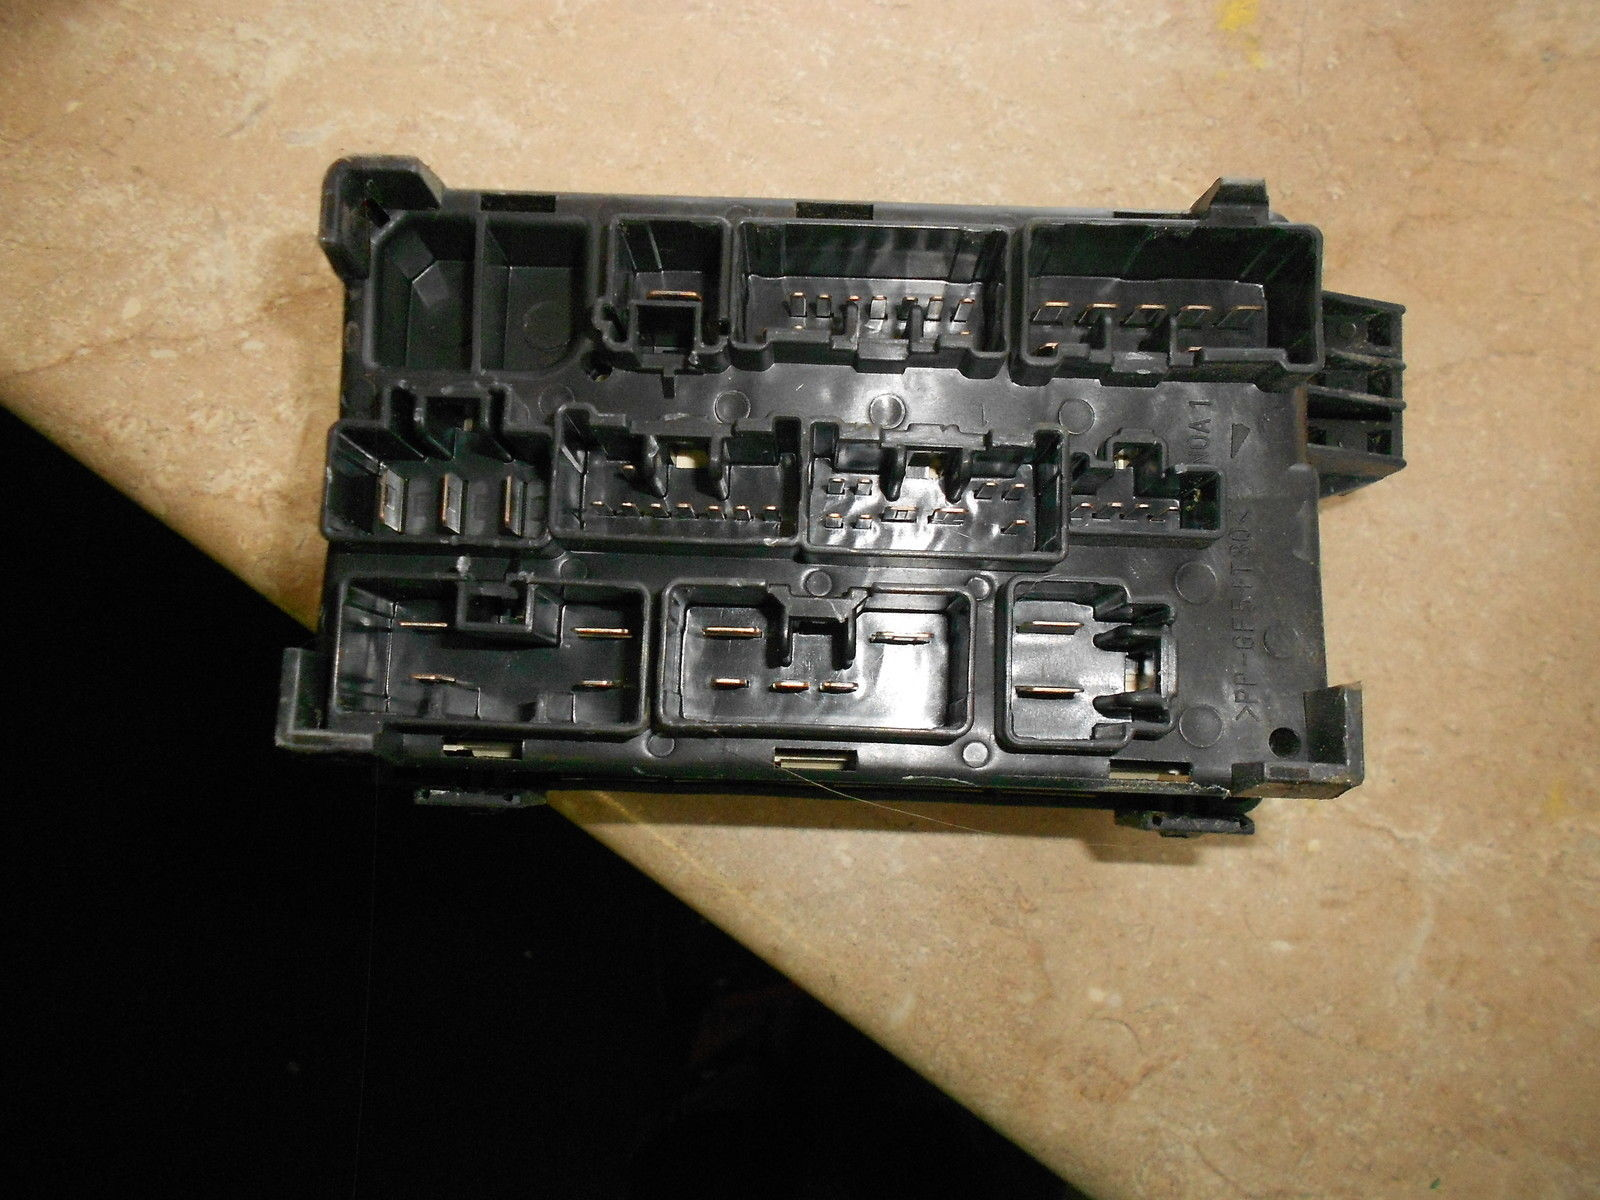 1999 toyota camry v6 auto fuse box oem yota yard ... 1998 toyota camry fuse box #12